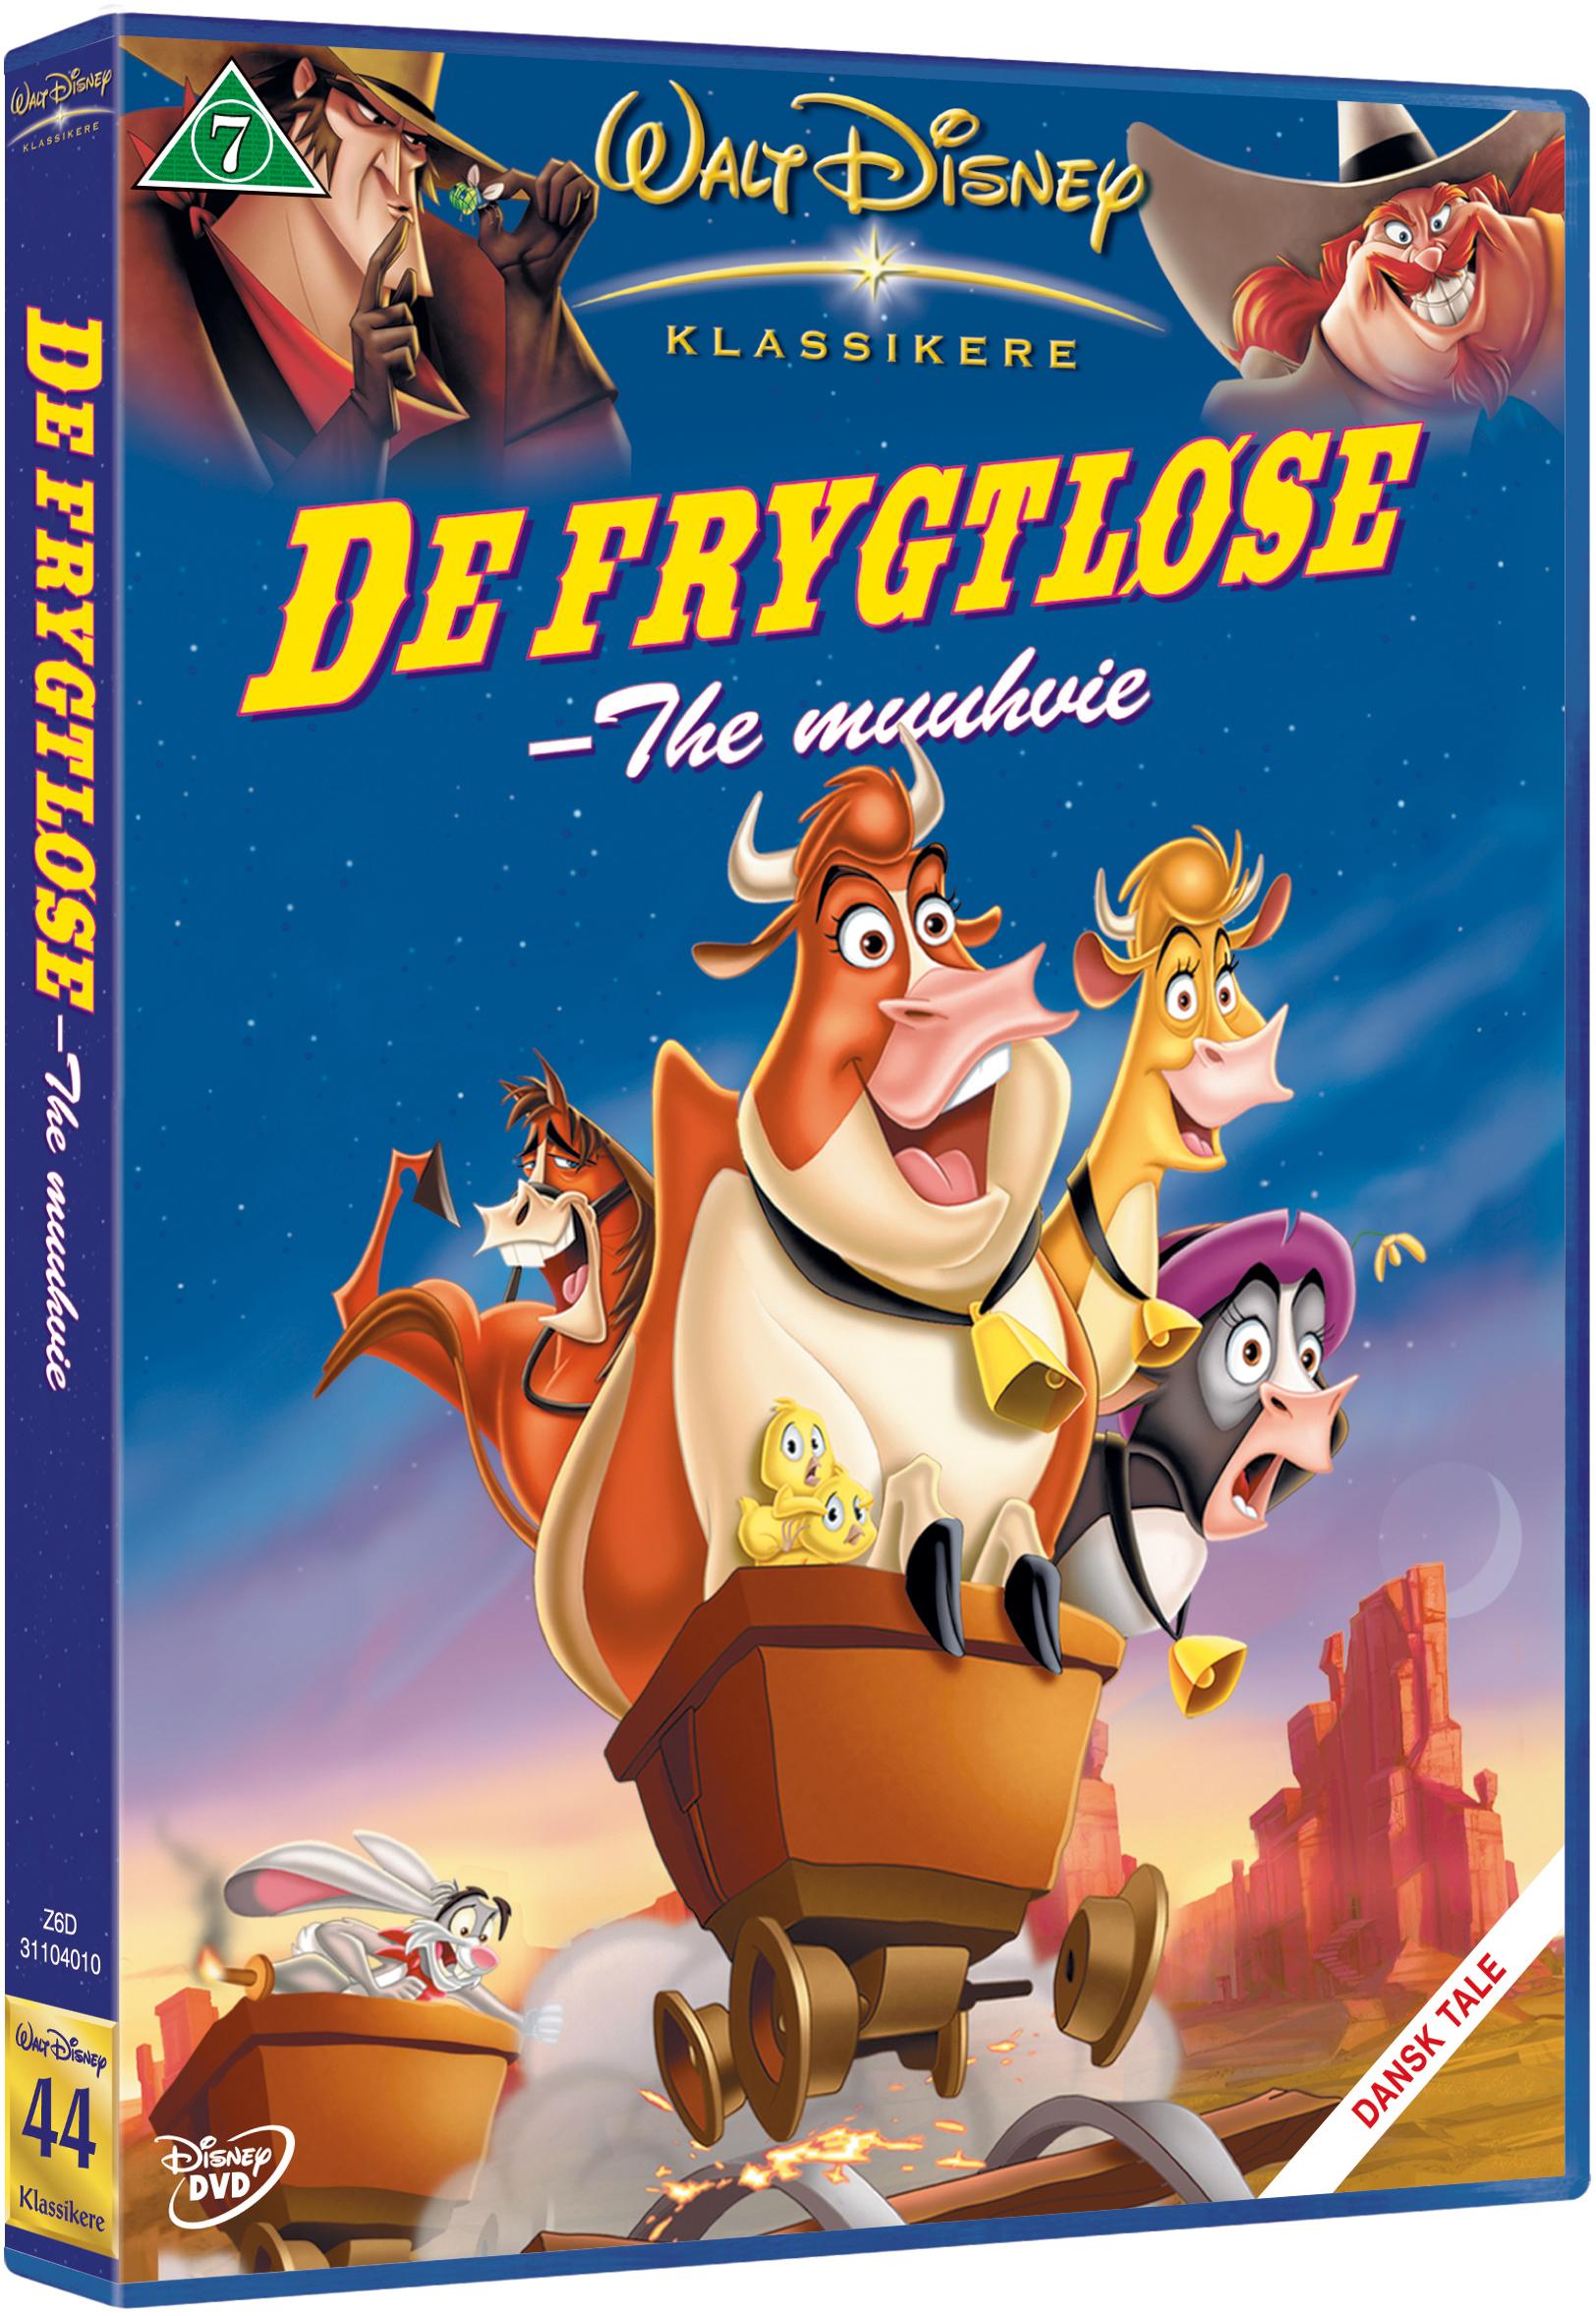 De frygtløse - Disney classic #44